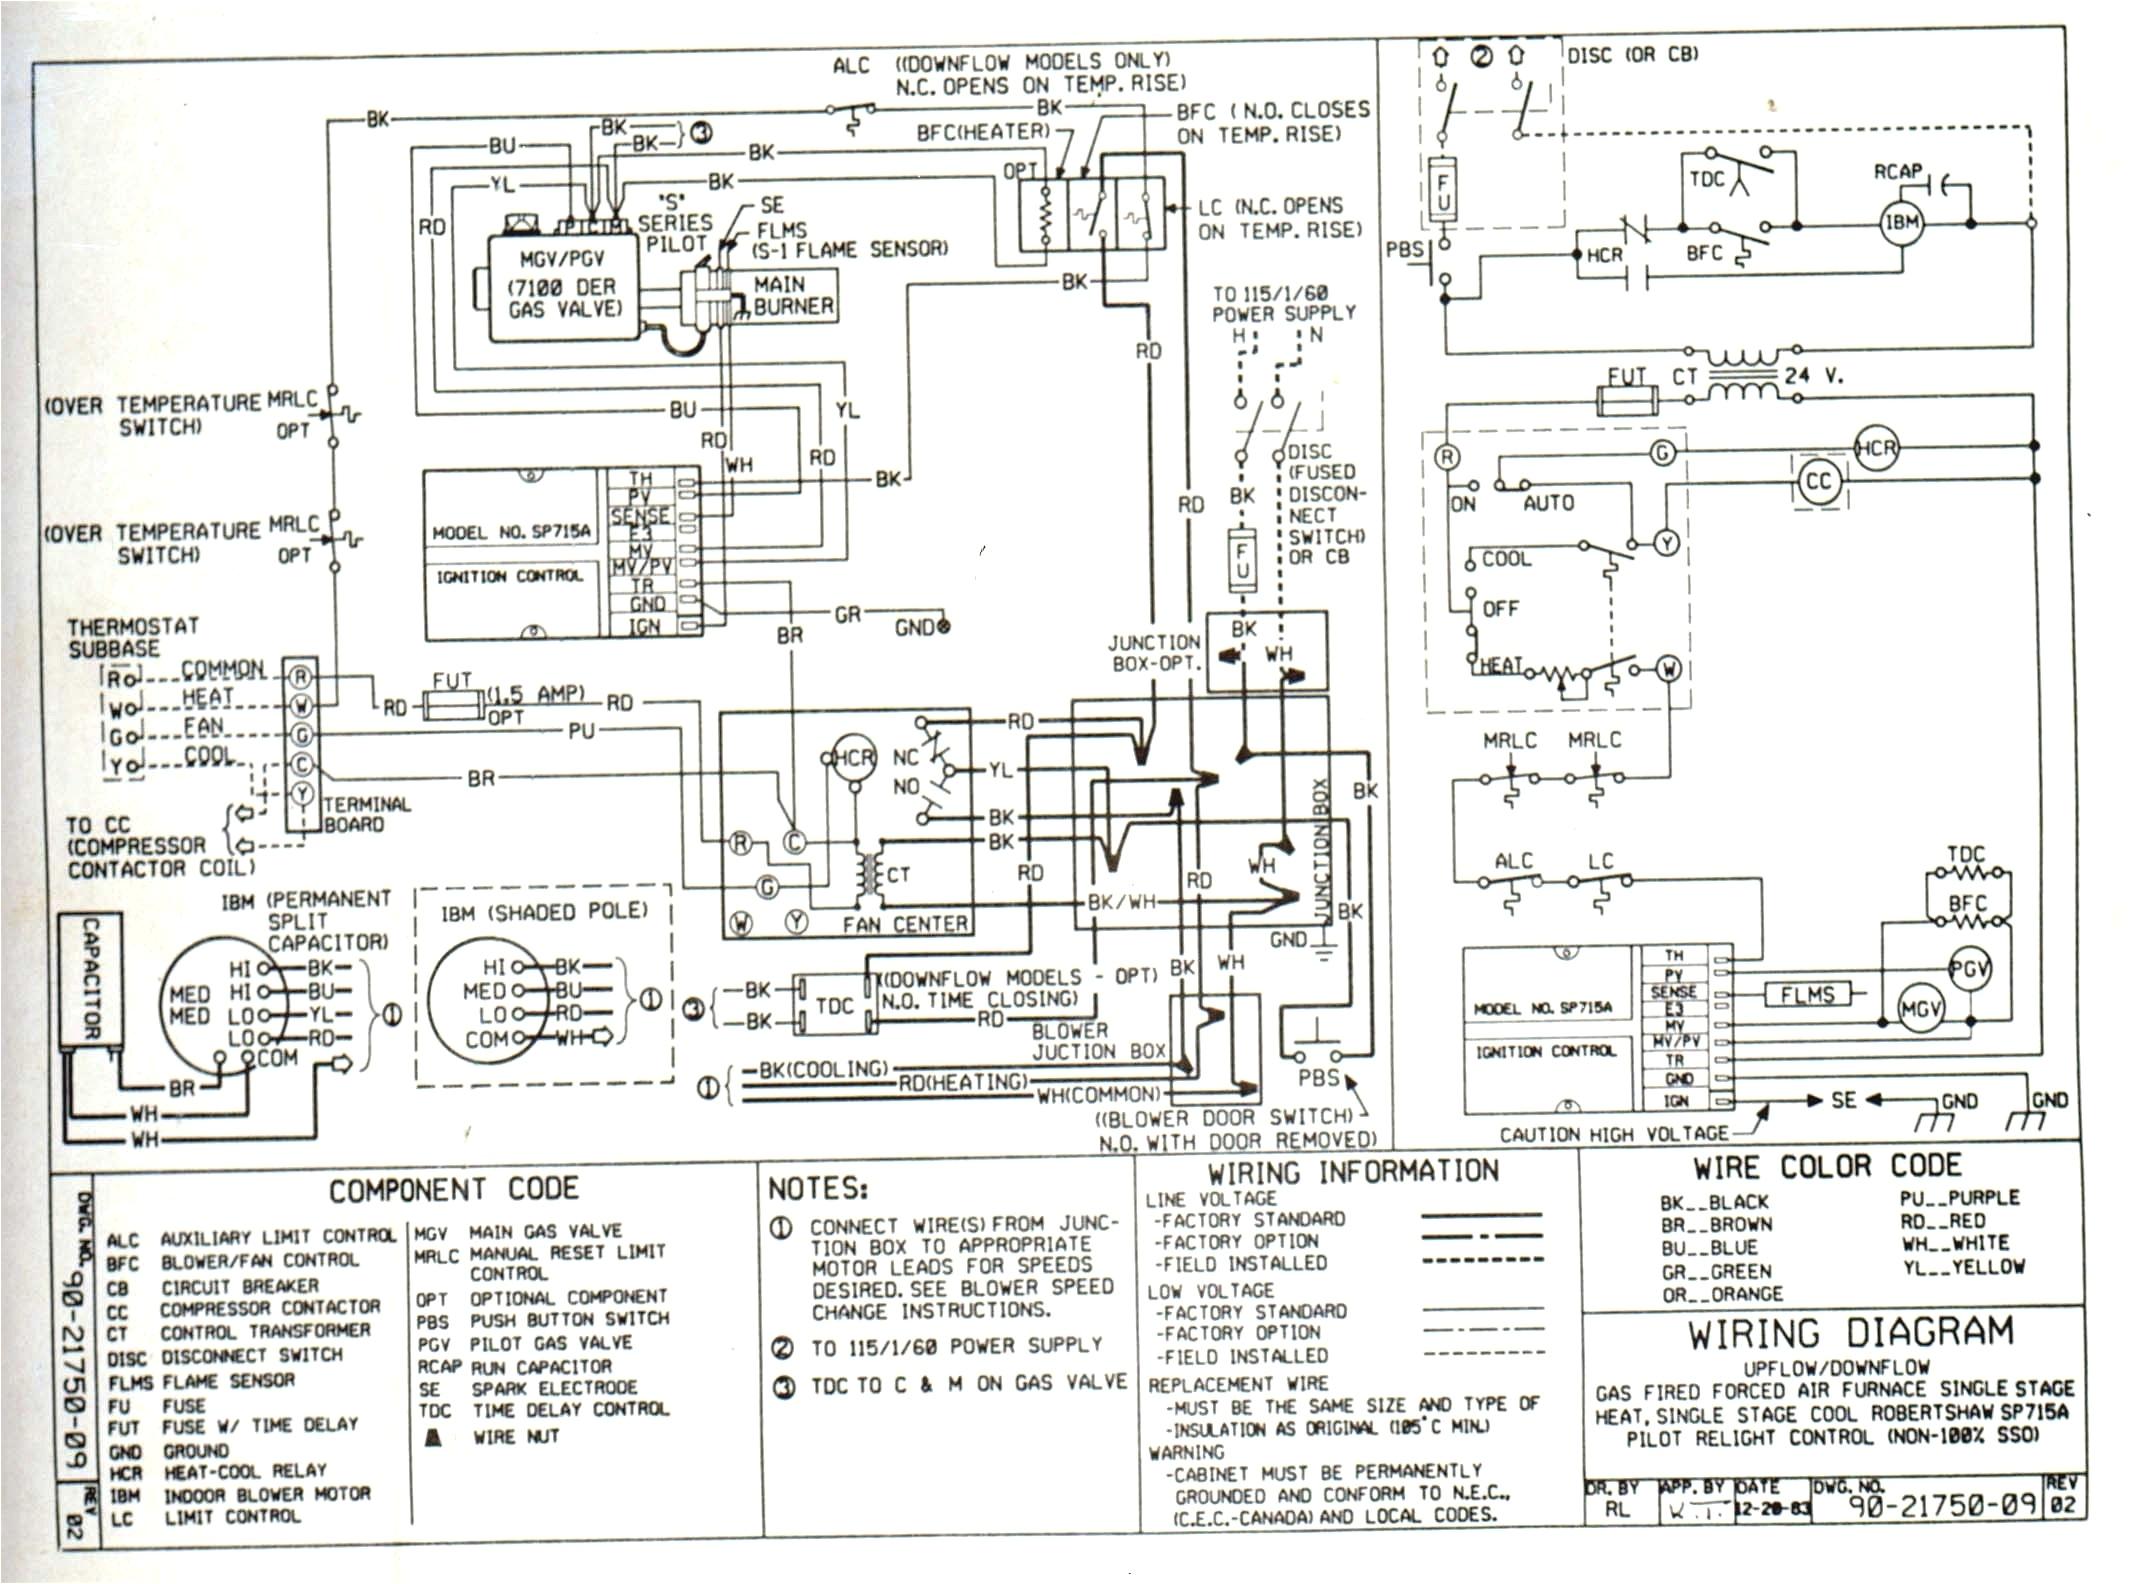 bryant 80 wiring diagram circuit diagram wiring diagram bryant plus 80 wiring diagram 80 gas